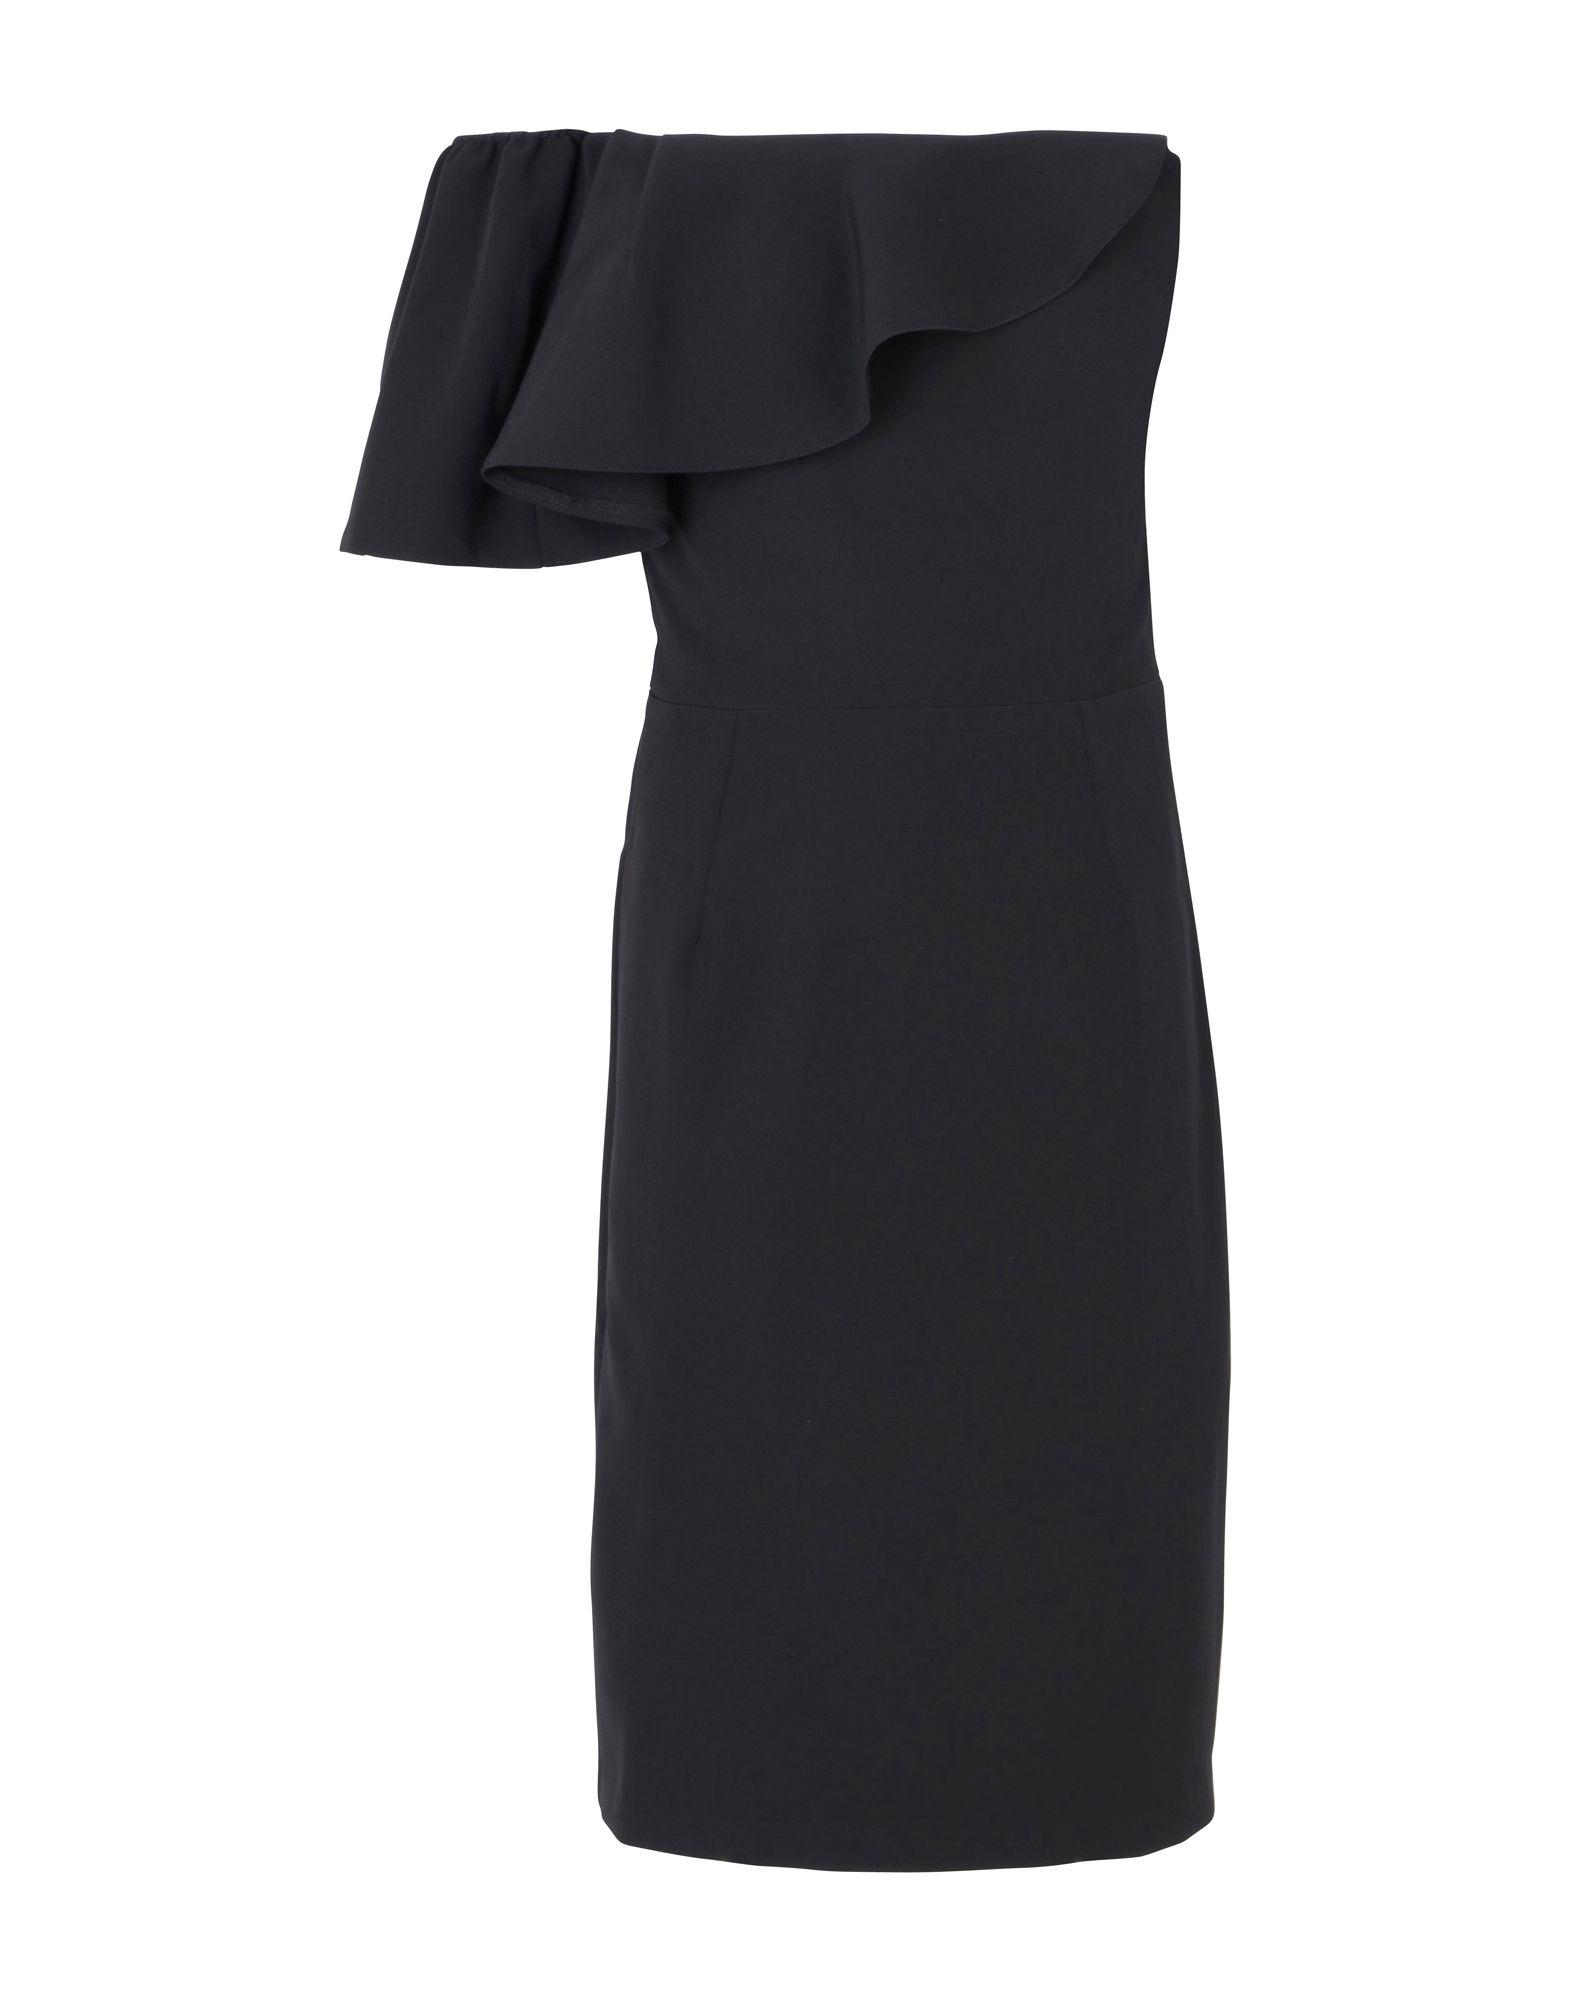 Adorée Short dress